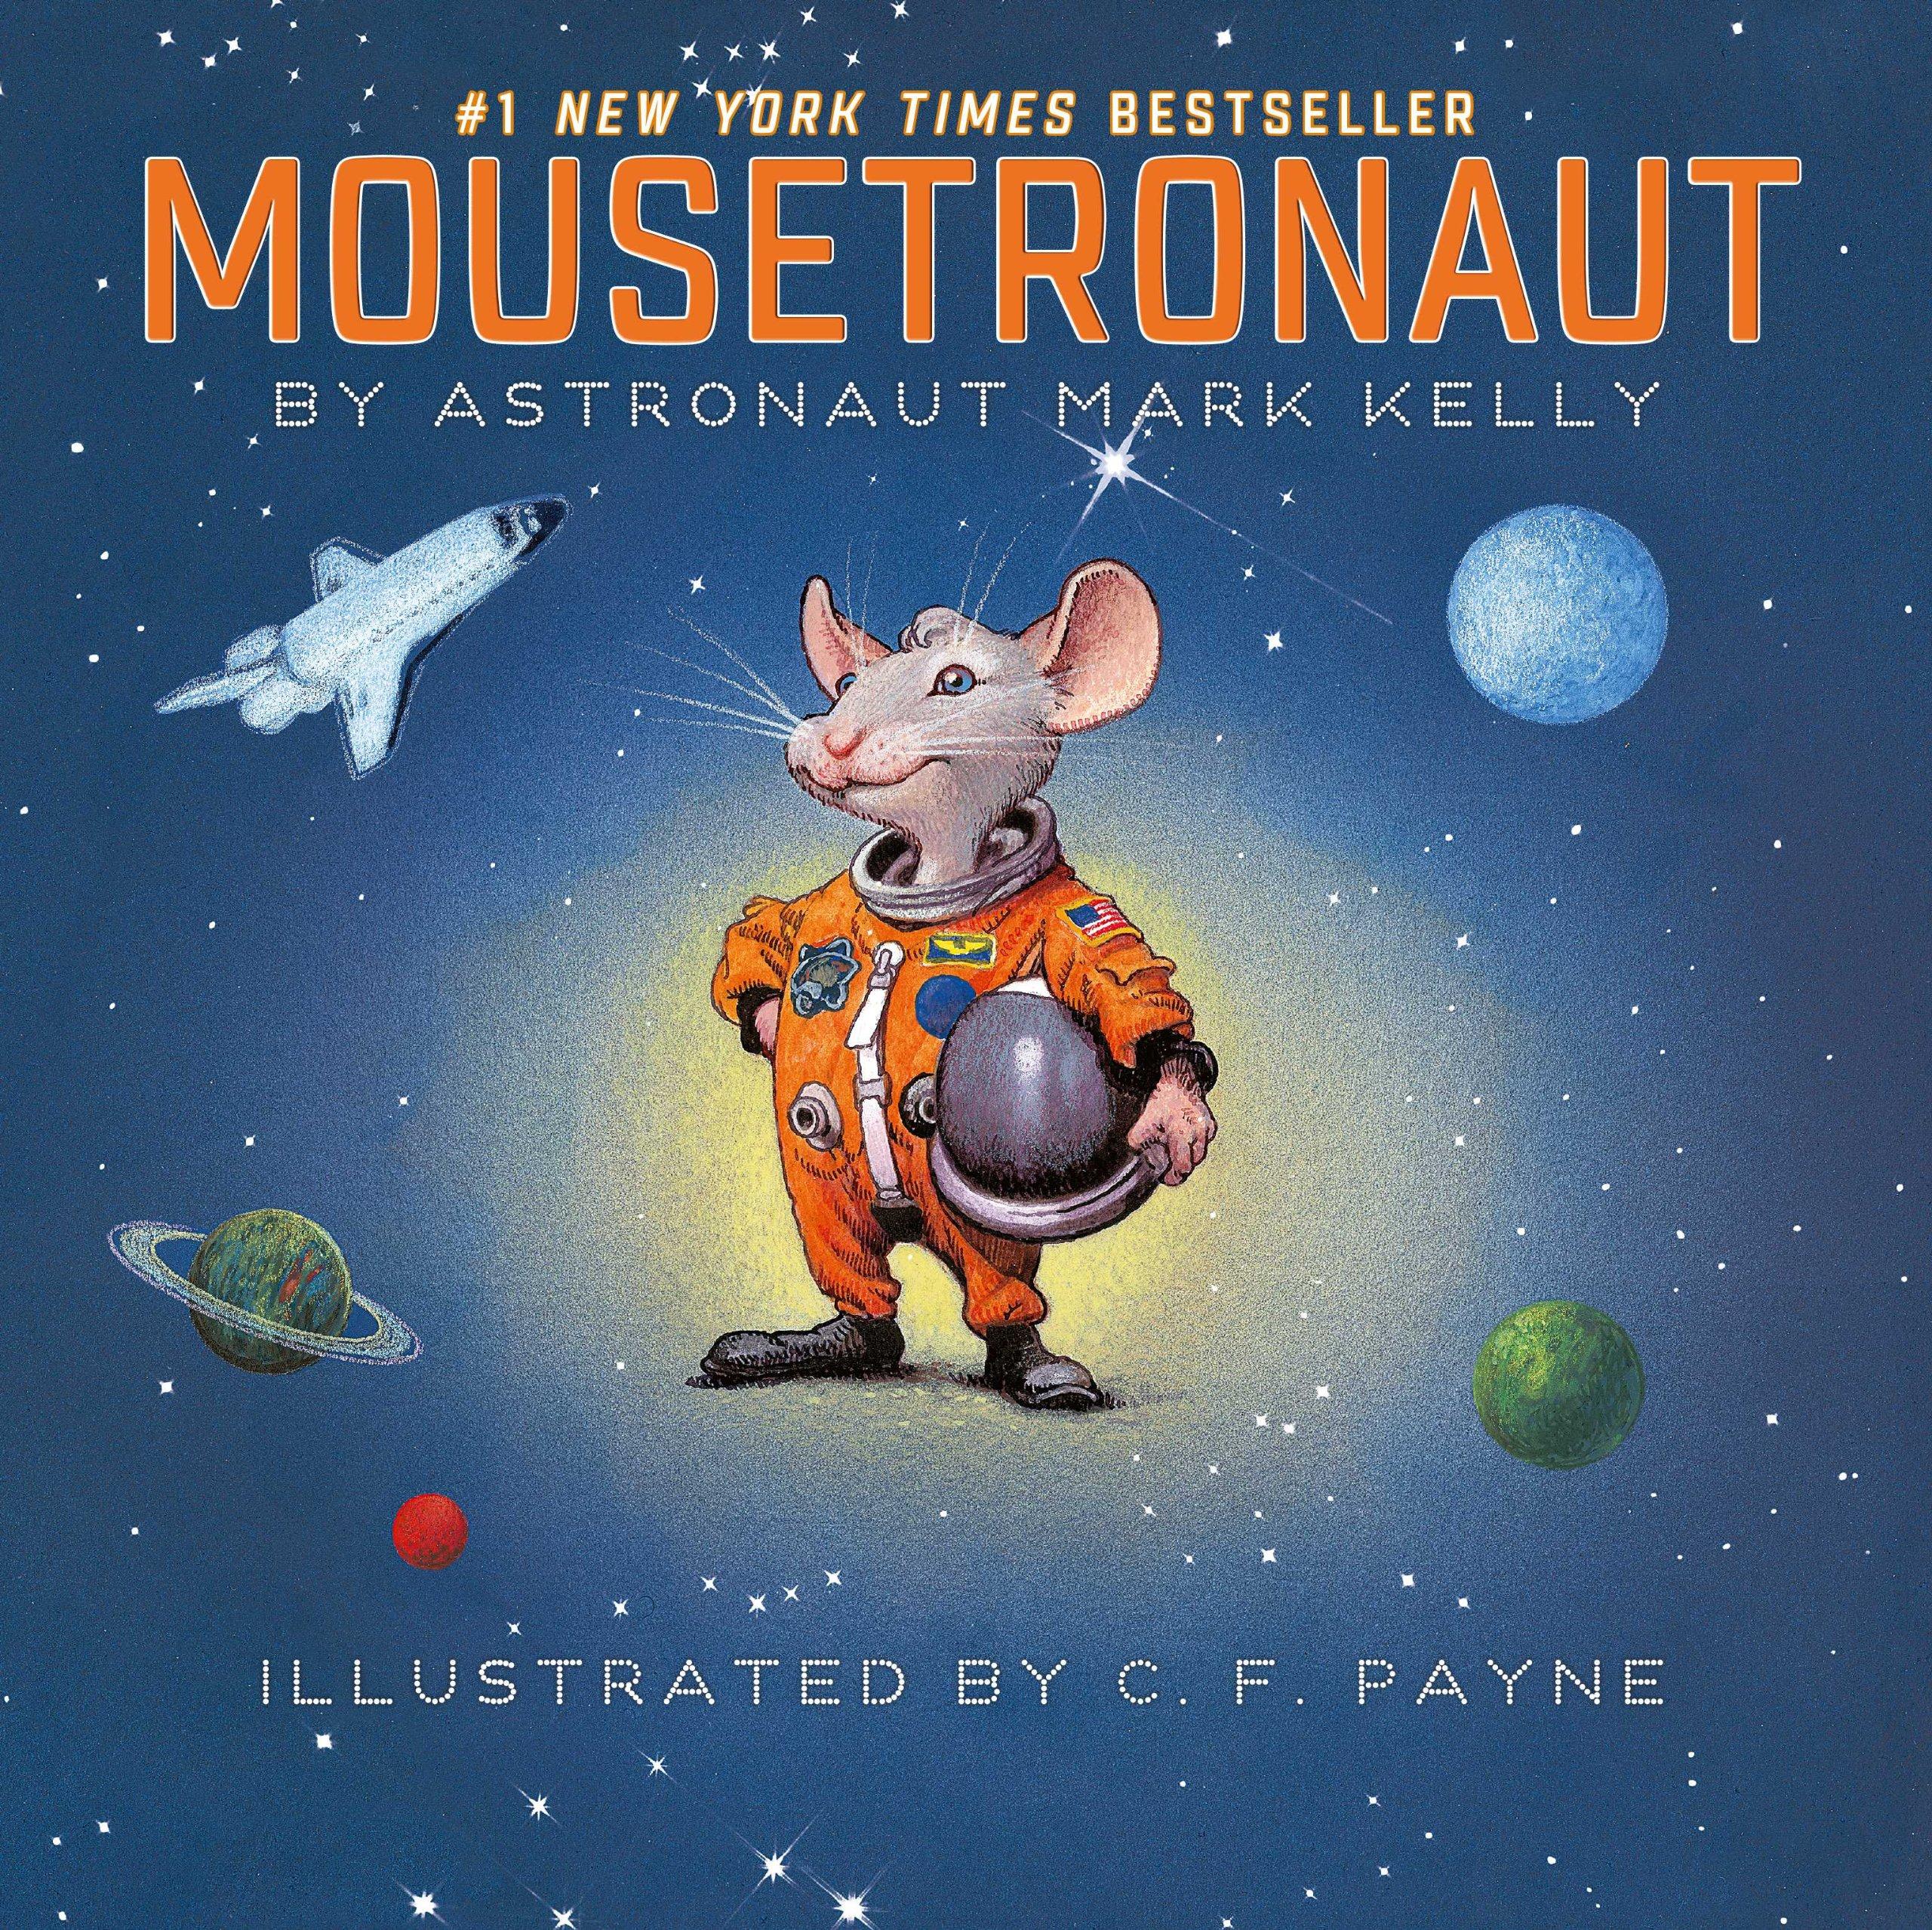 space mousetronaut